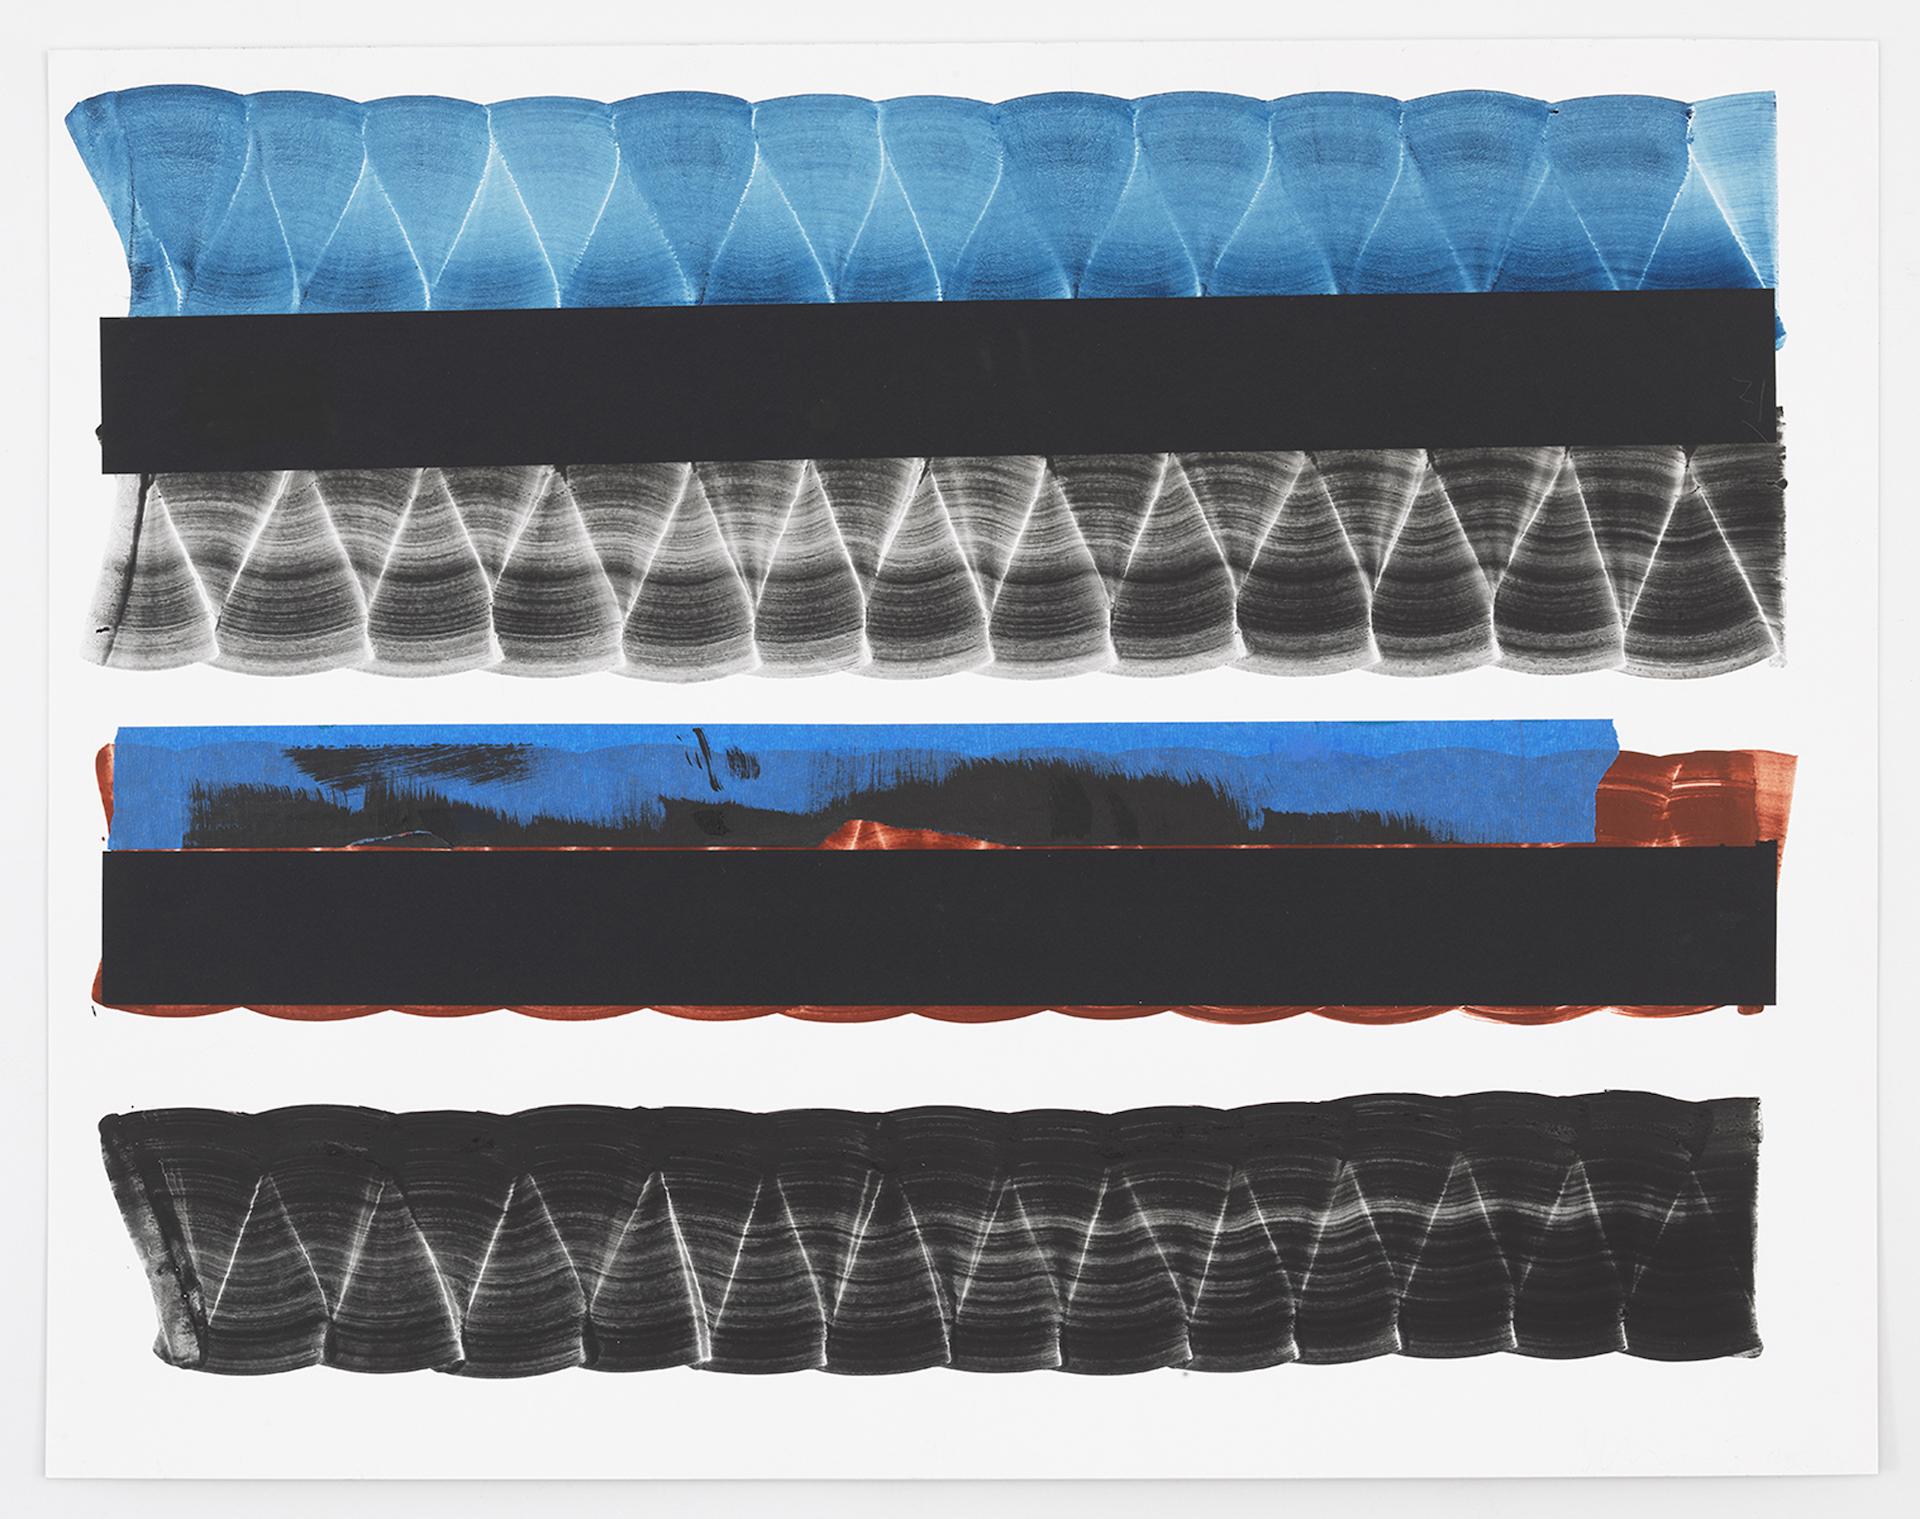 Juan Uslé Notes on SQR, 2020 Mixed media on paper 22x28inches(56x71cm) © Juan Uslé Courtesy Galerie Lelong & Co.